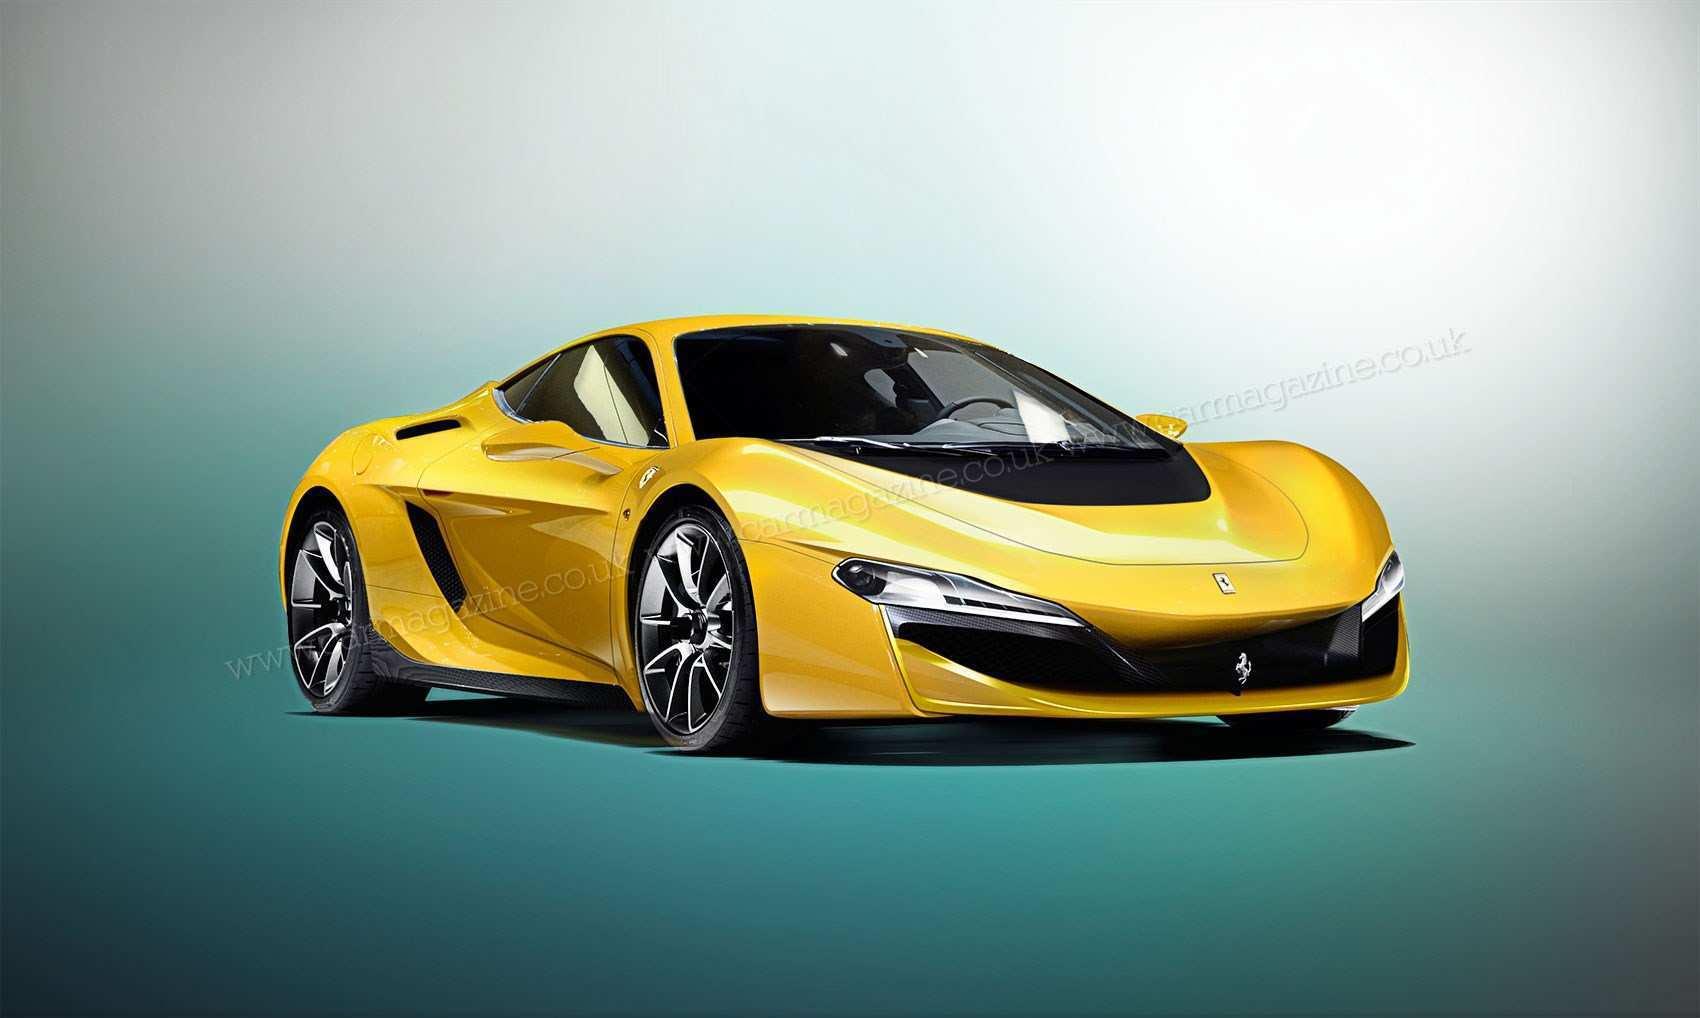 28 Concept of Ferrari V6 2019 Overview with Ferrari V6 2019